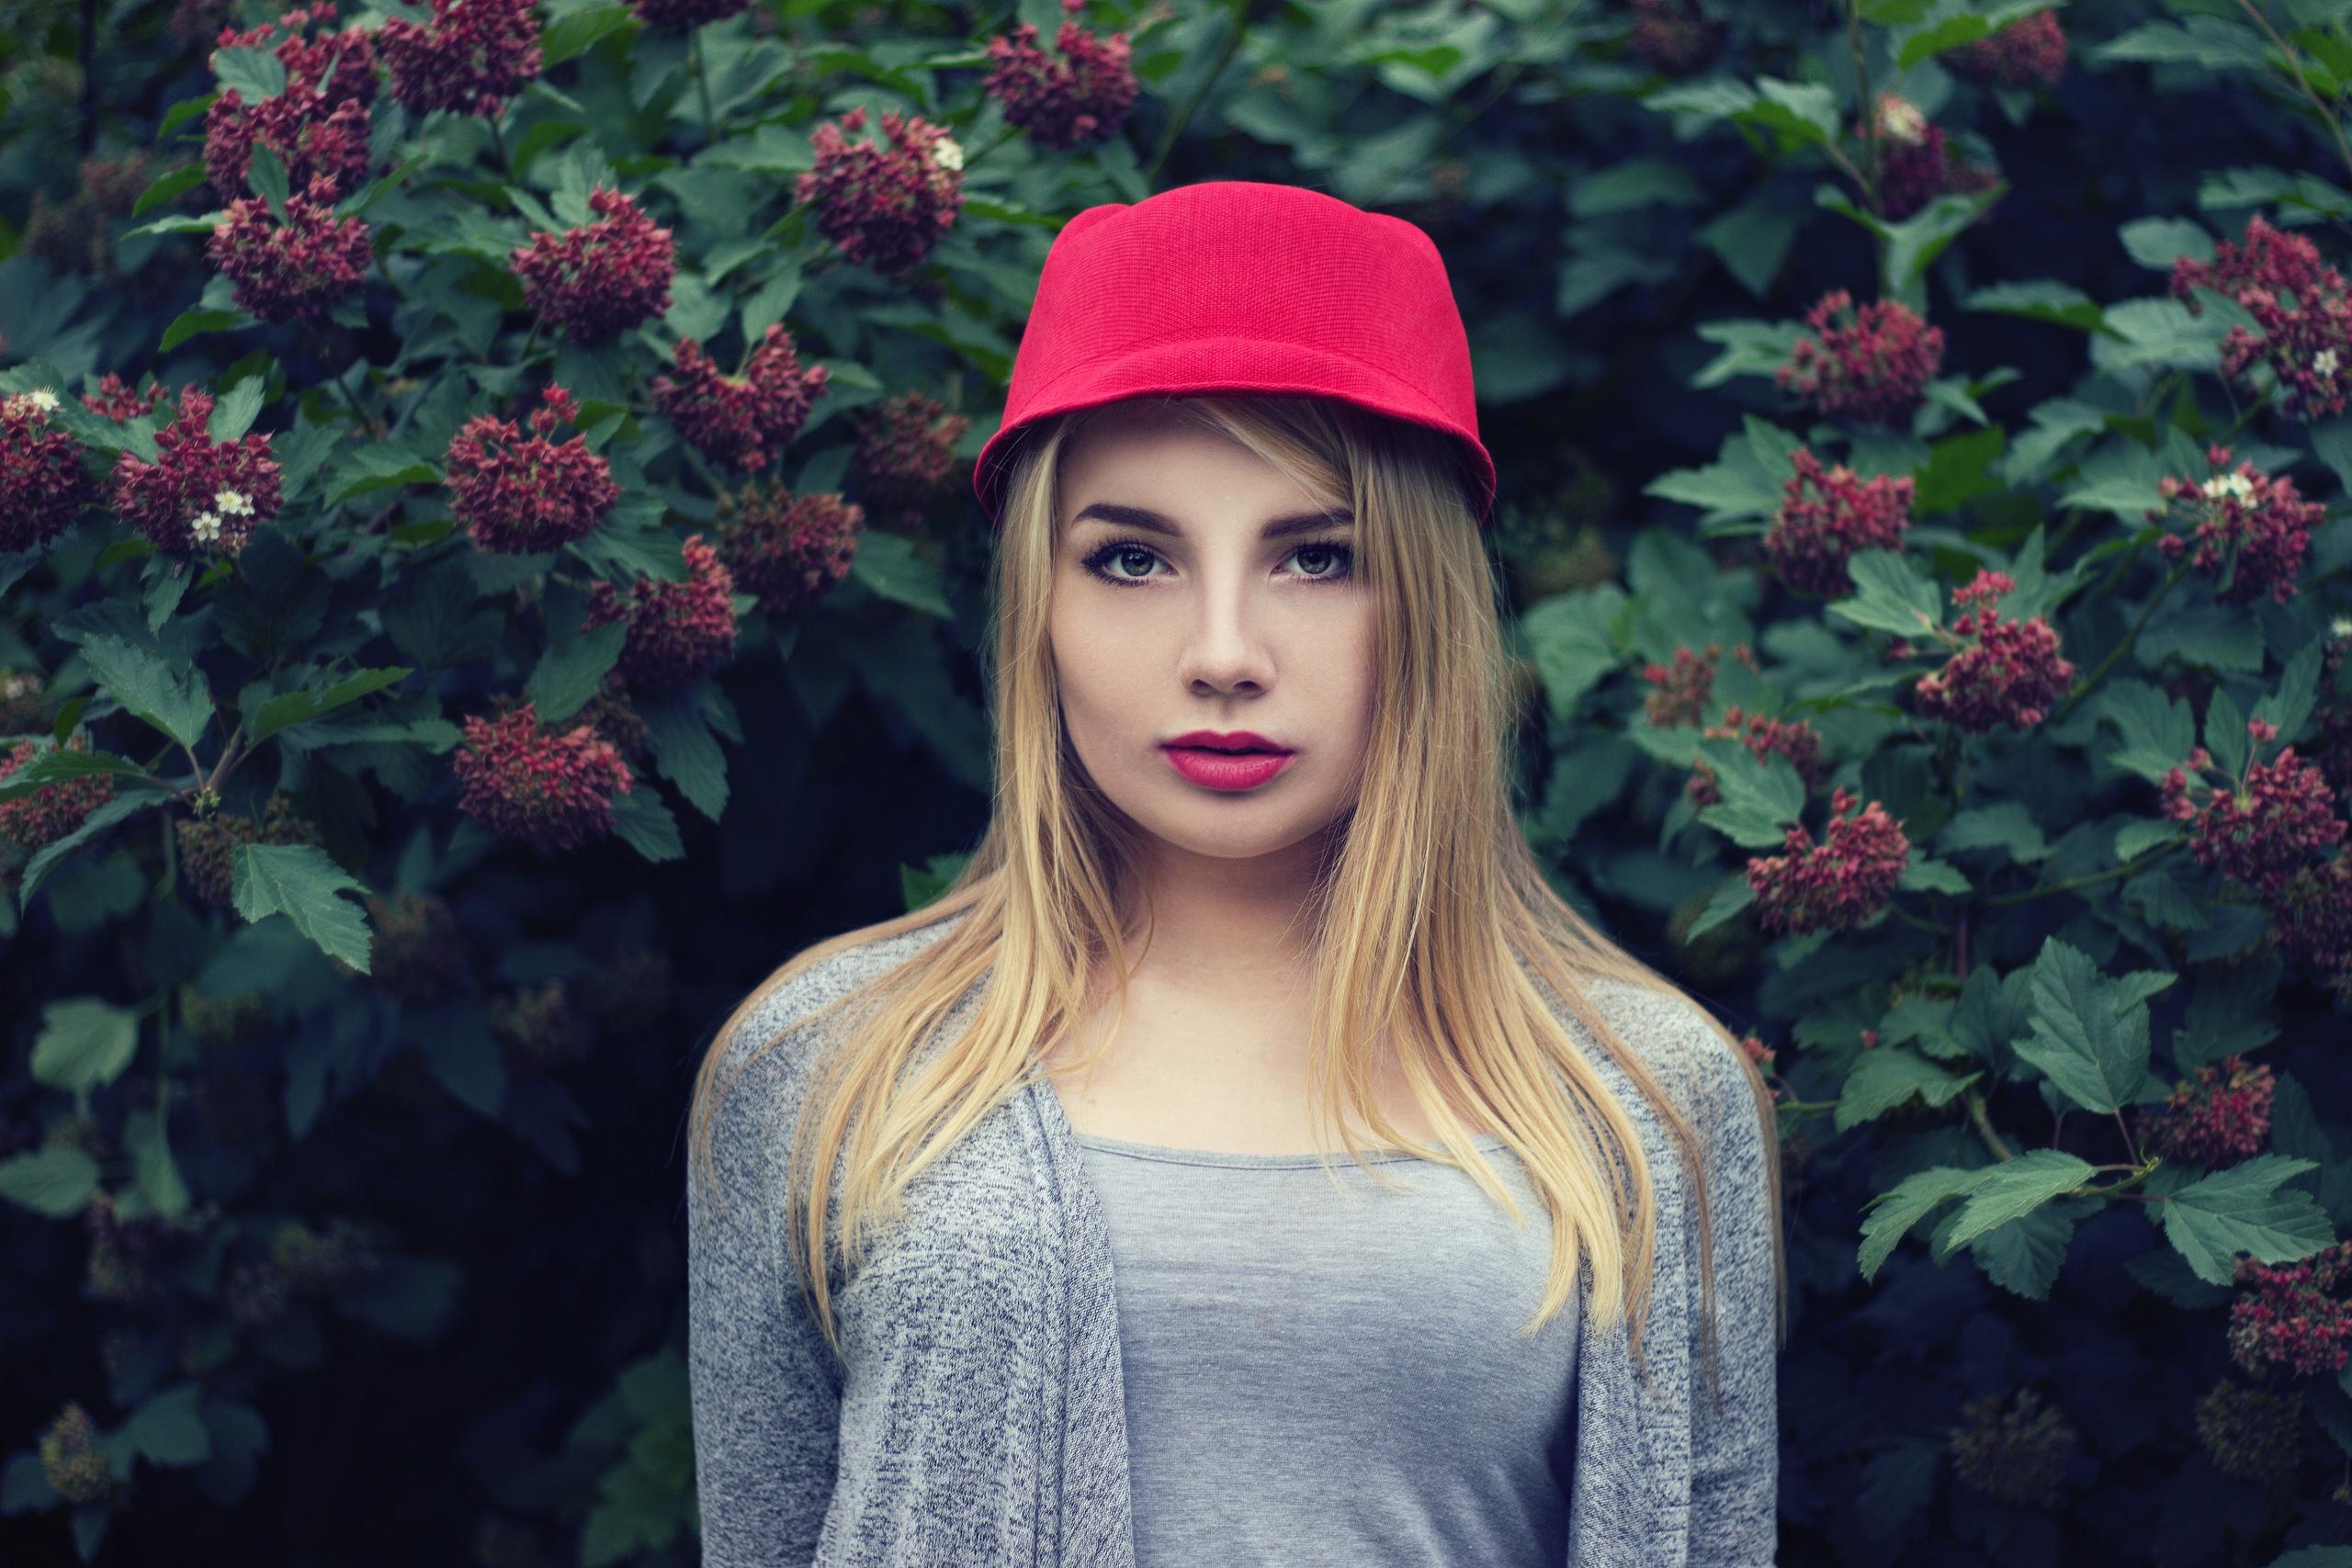 women model blonde looking at viewer Women with Hats flowers face red  lipstick portrait women outdoors 0eebcad1e4b